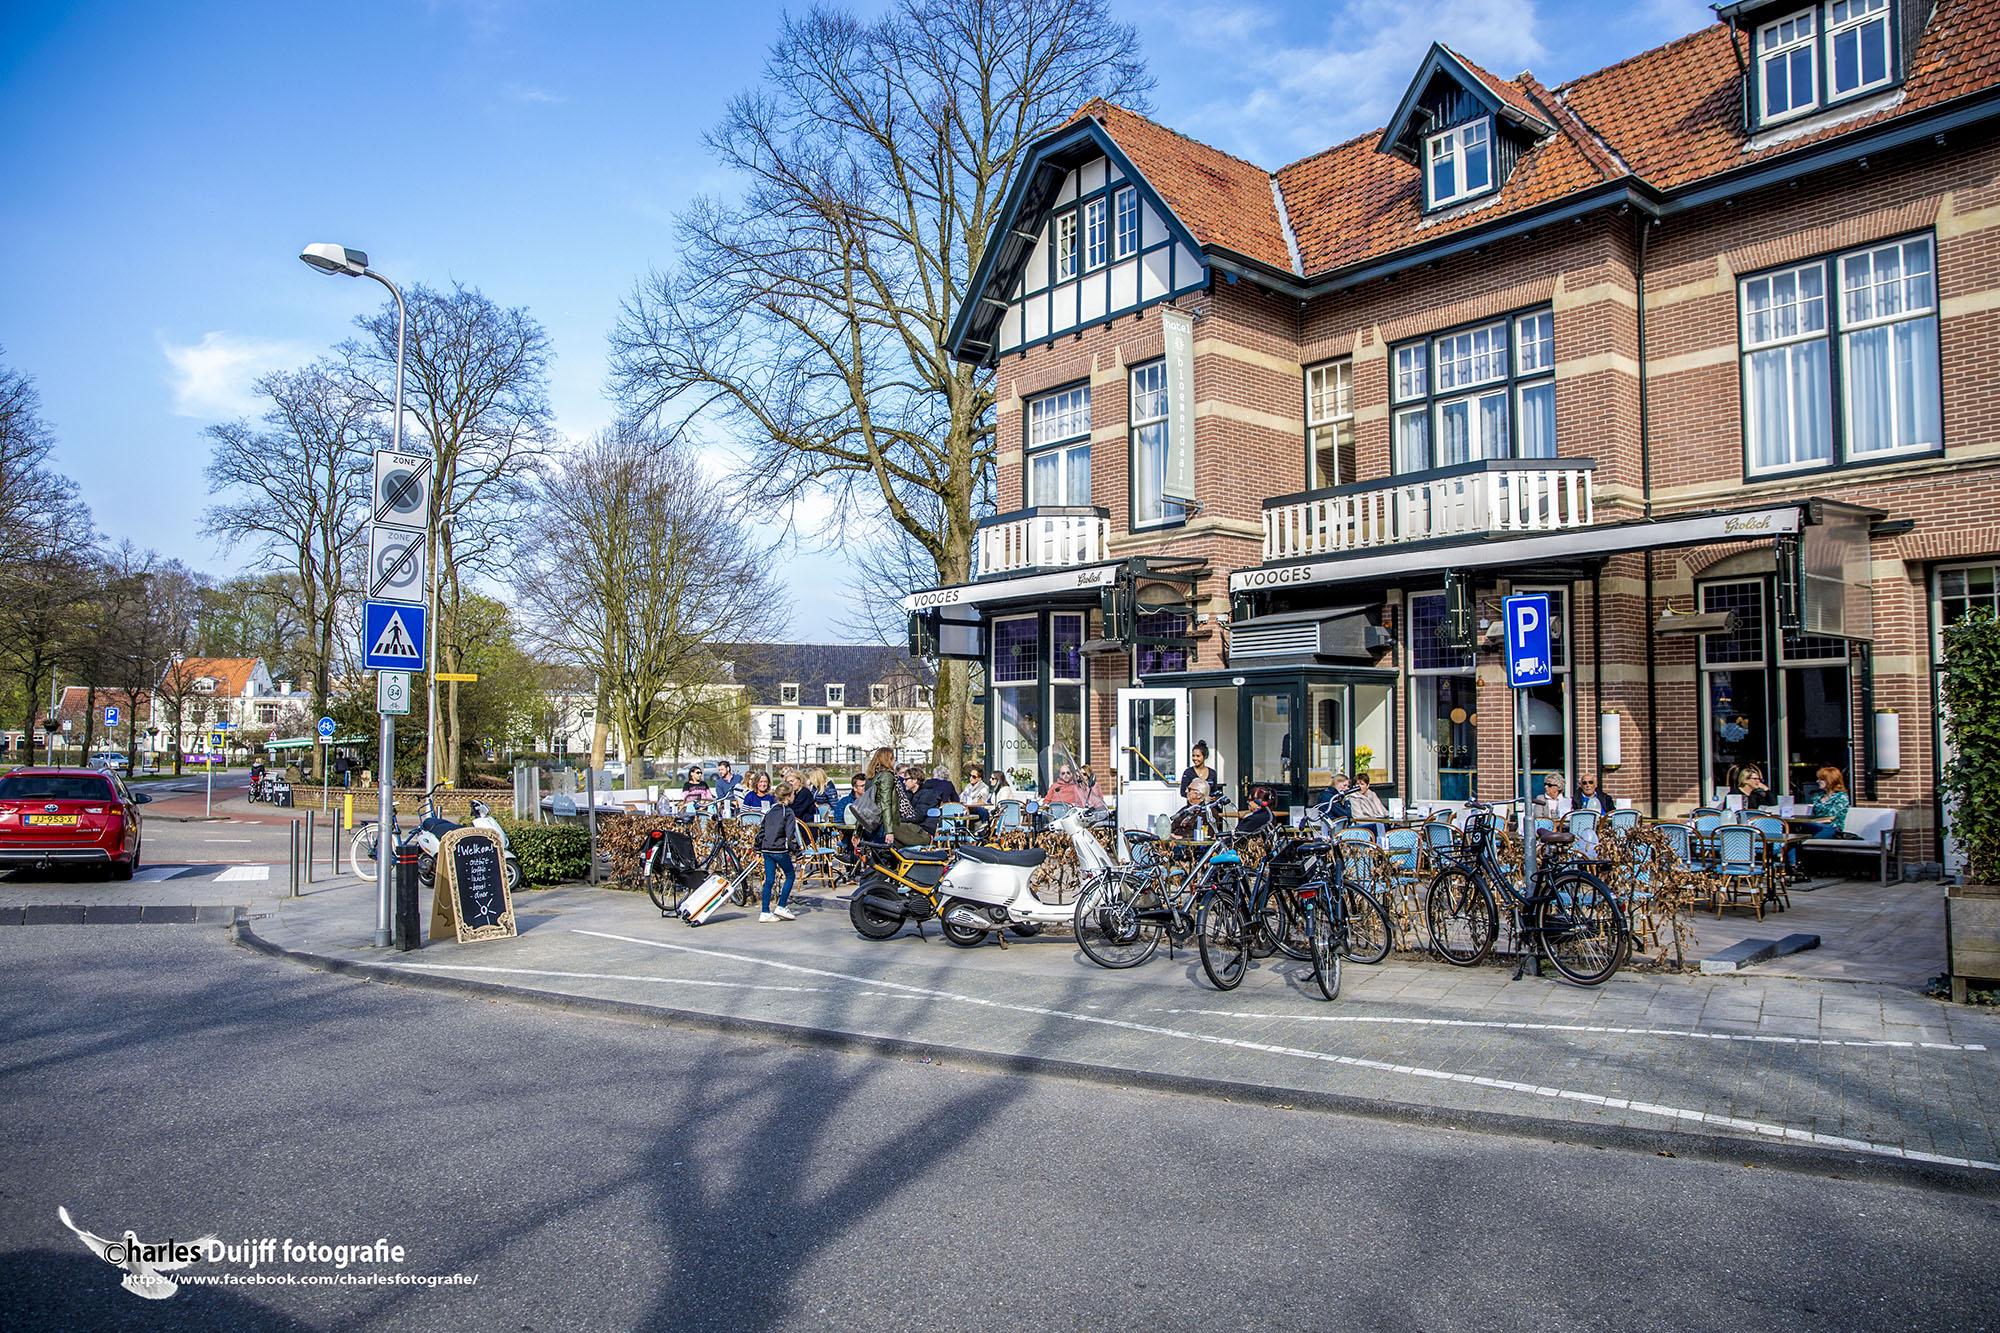 Homepagina Freeagirl NL